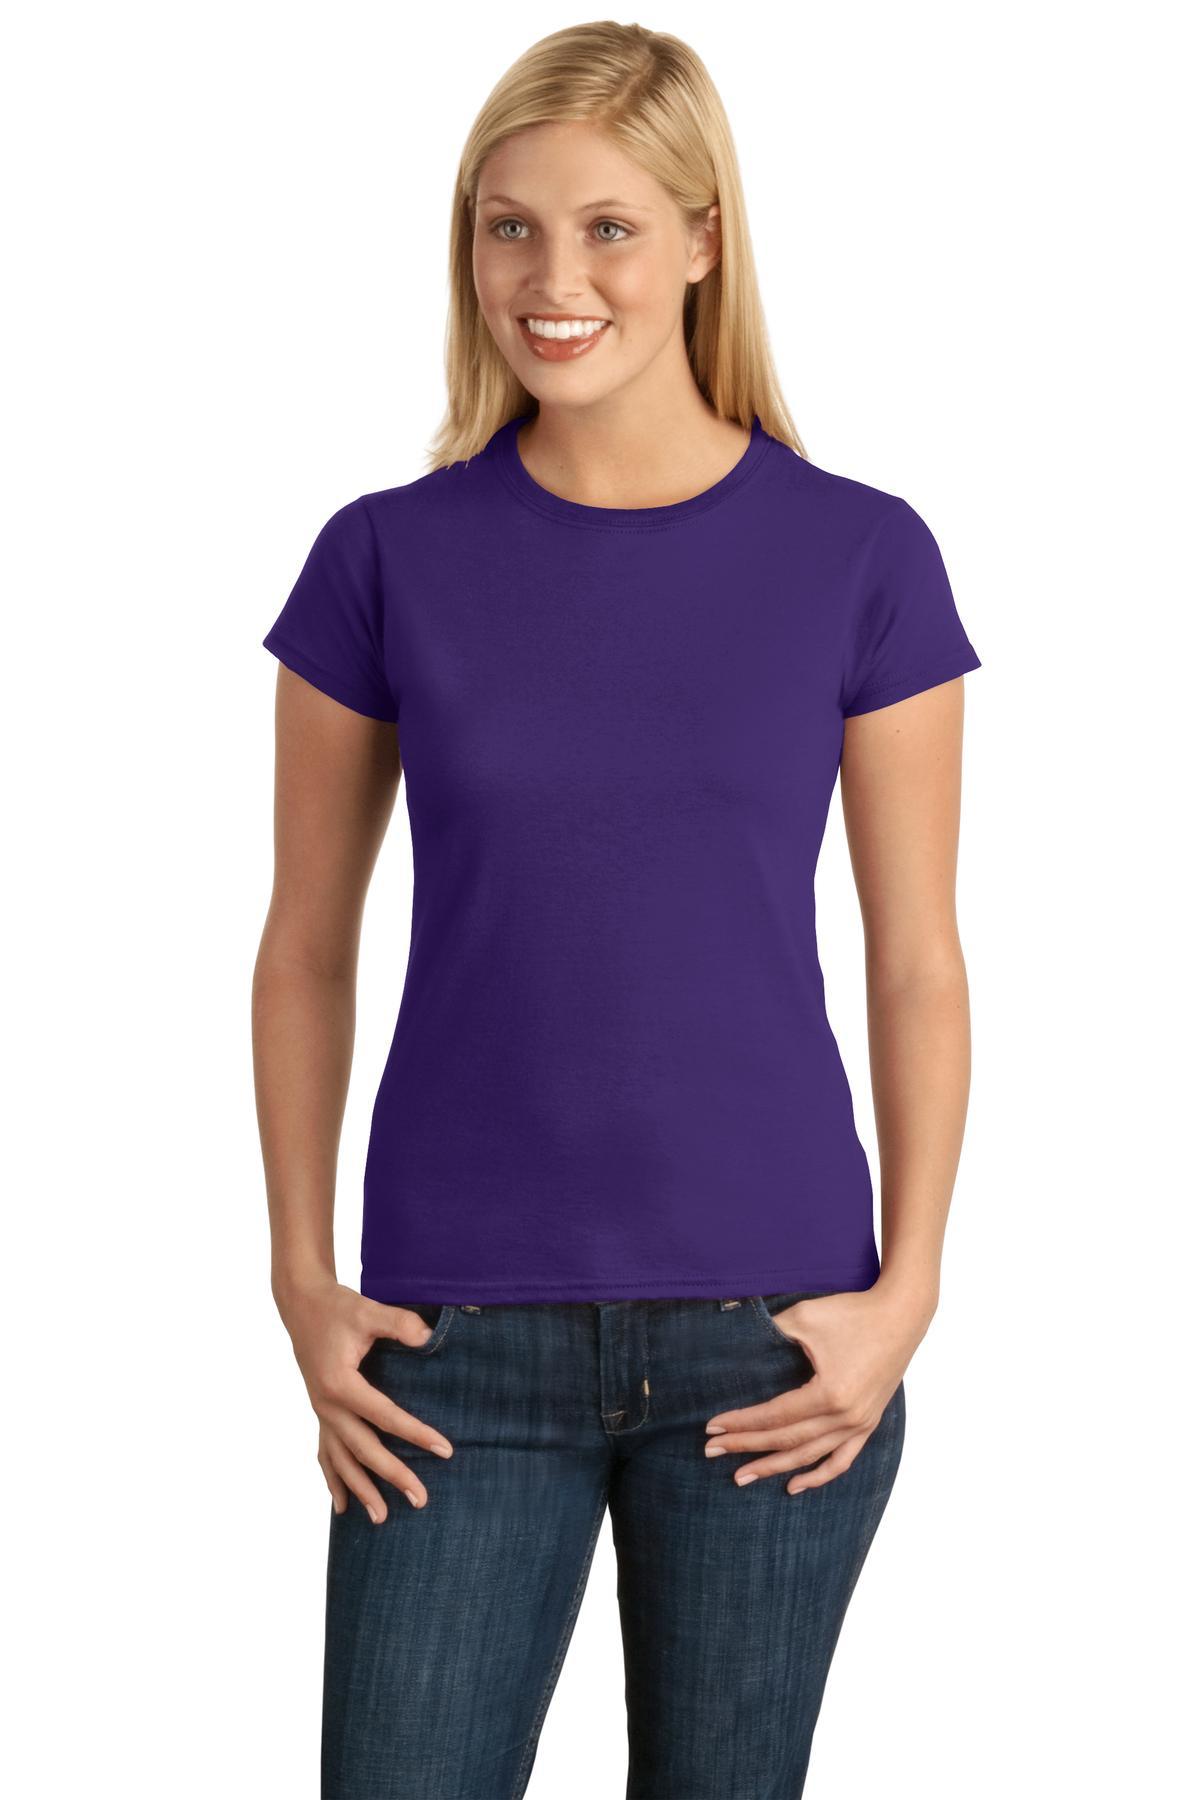 Gildan - Softstyle Junior Fit T-Shirt. 64000L